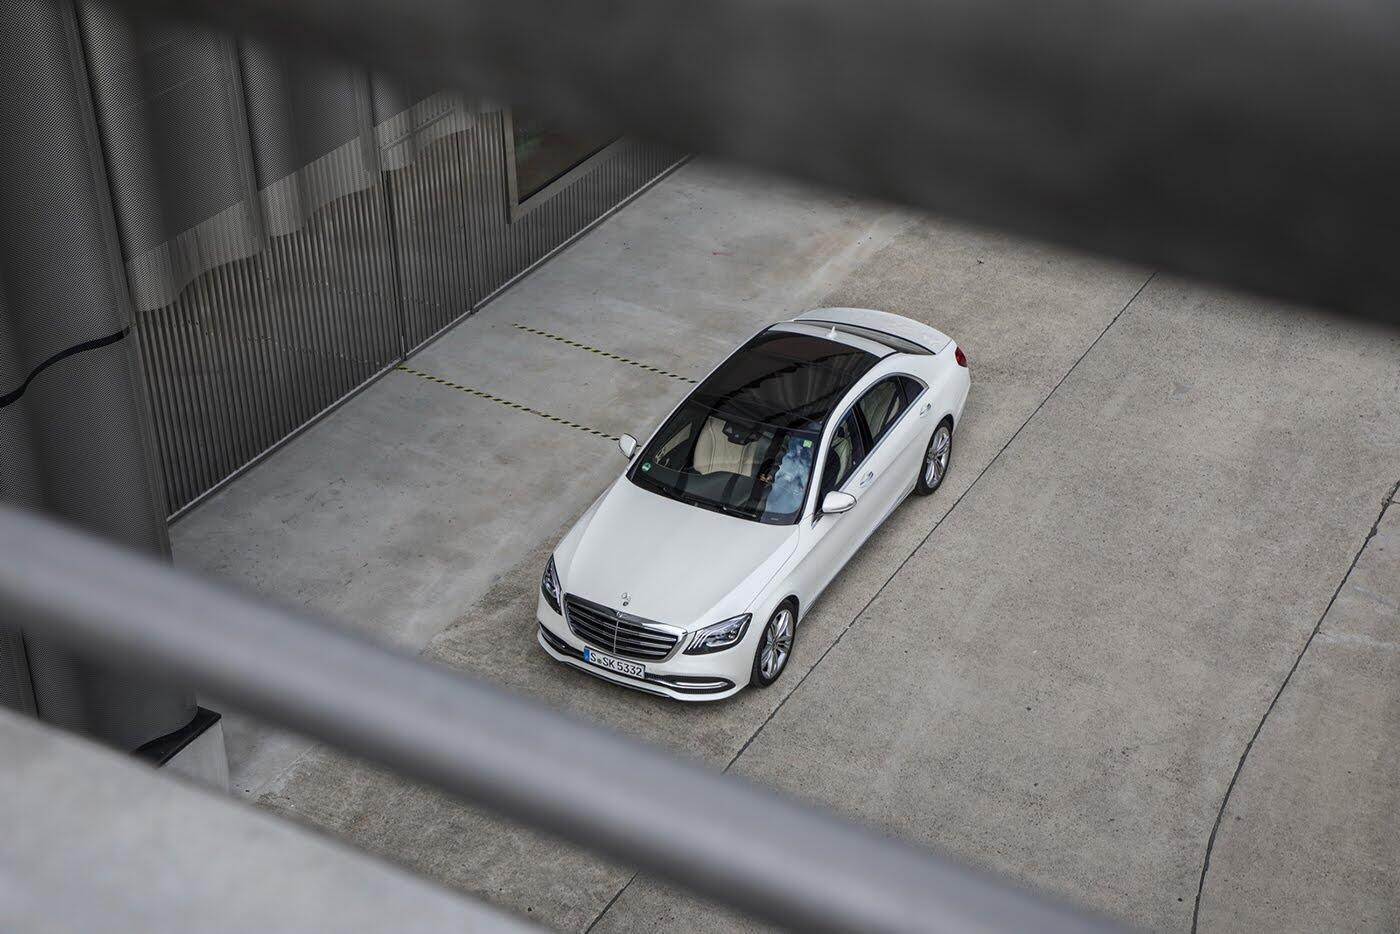 Ảnh chi tiết Mercedes-Benz S-Class 2018 - Hình 36